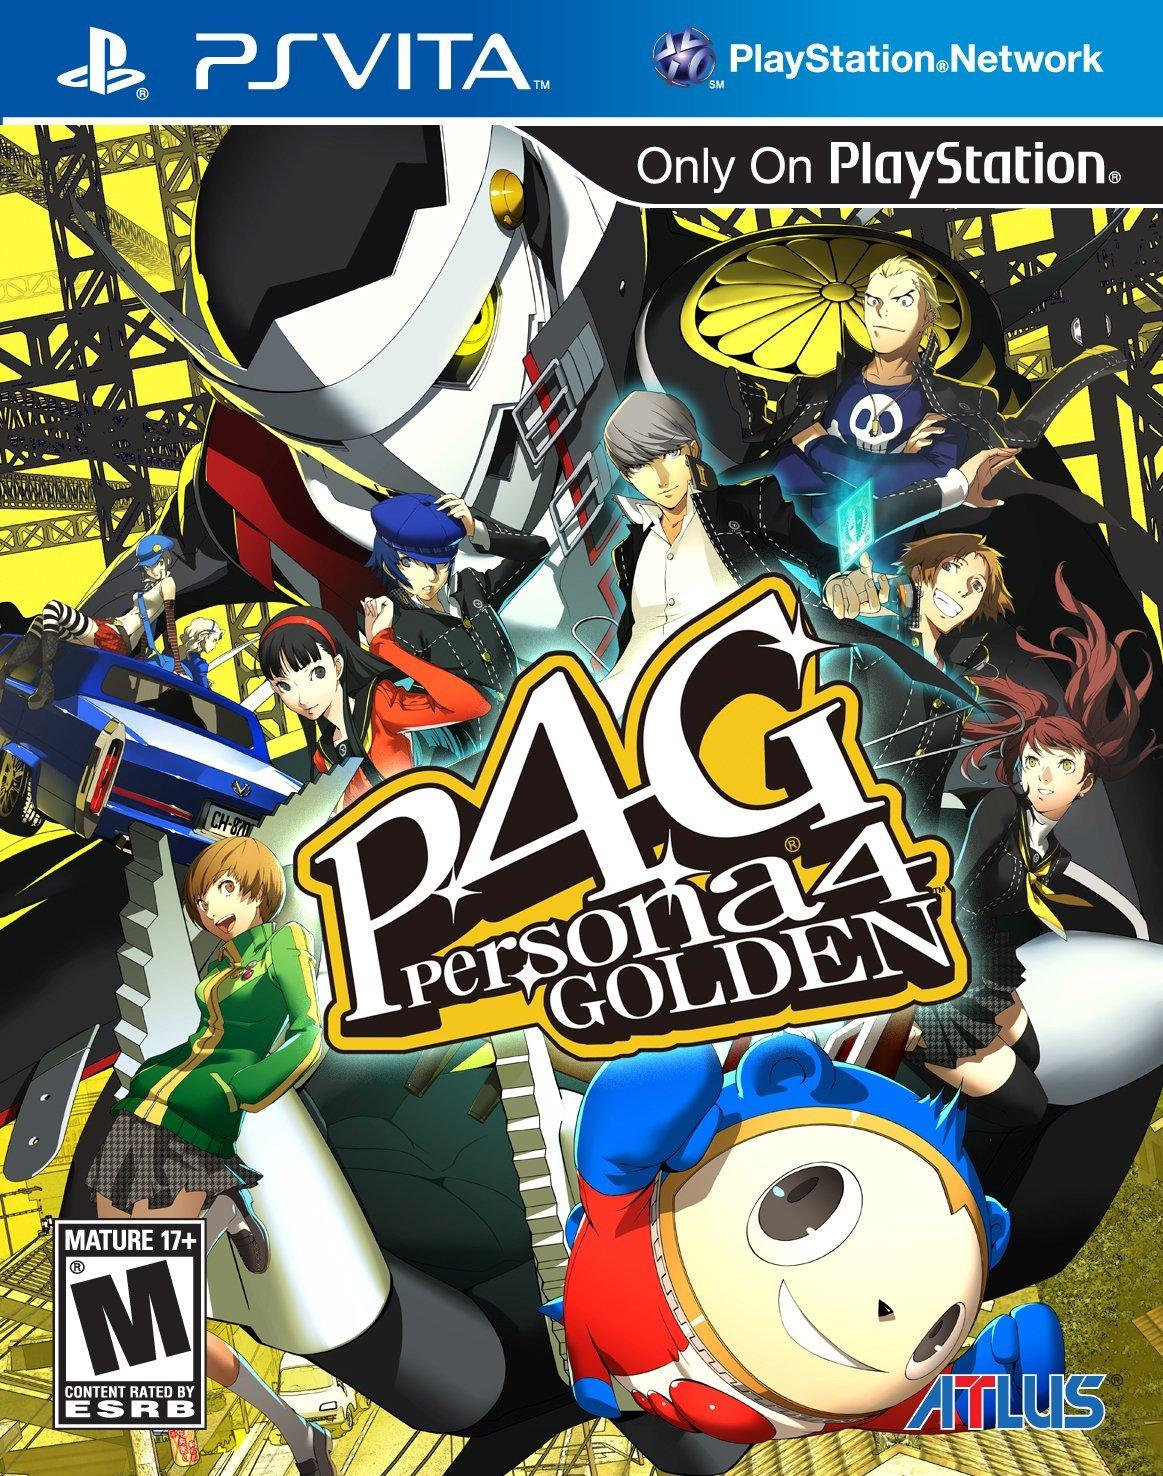 13 Best PS Vita RPGs as of 2019 - Slant Persona World Map on zelda twilight princess world map, tales of vesperia world map, monster hunter world map, tales of legendia world map,